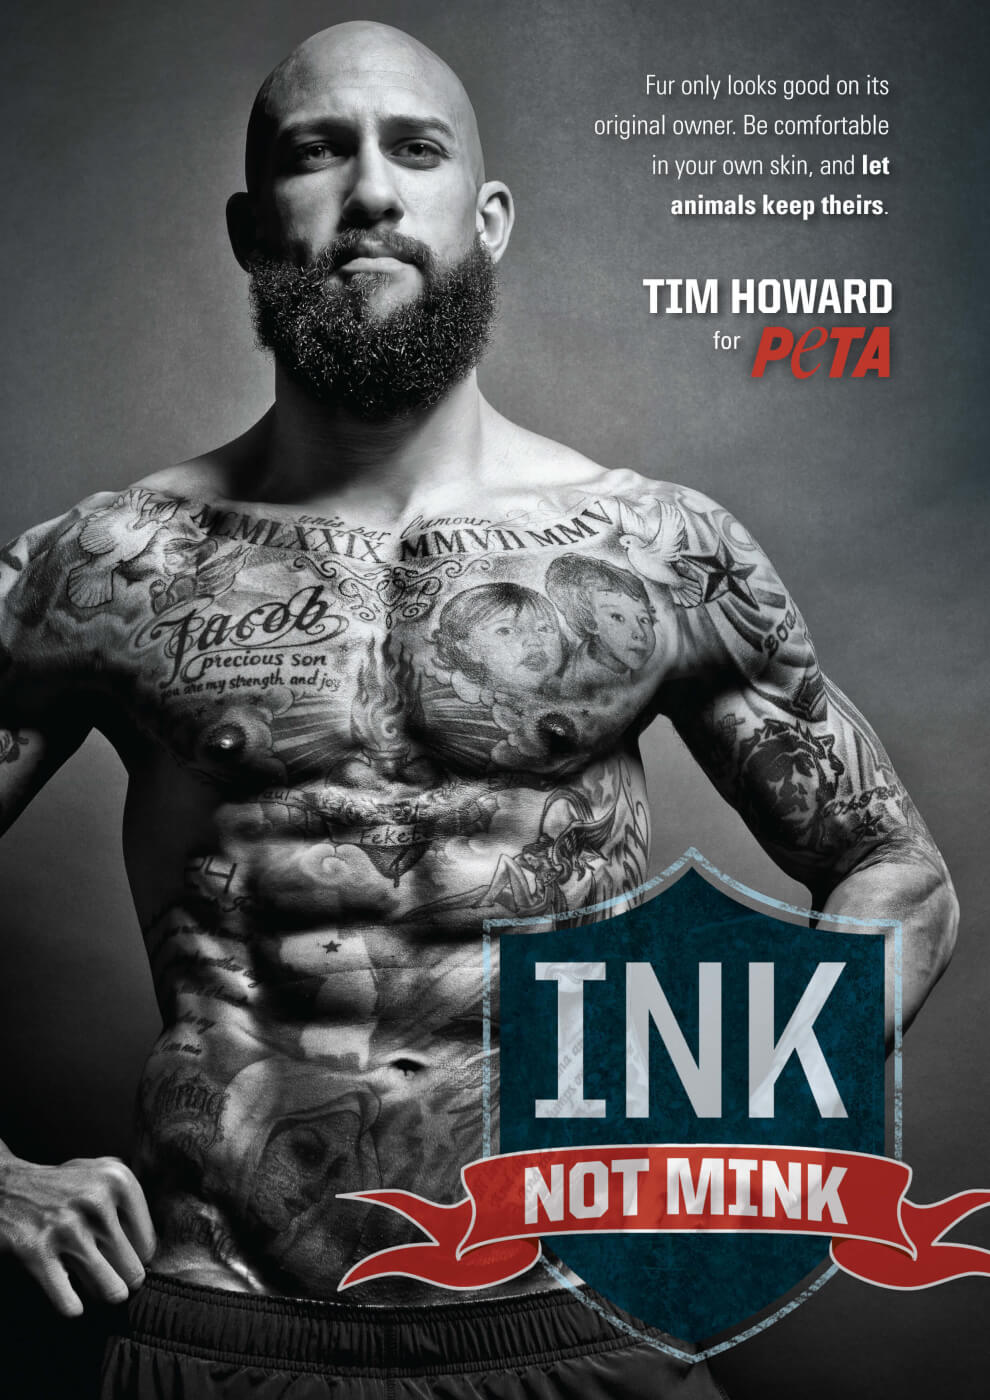 Tim-Howard-Ink-Not-Mink jpgTim Howard Goalie Wife